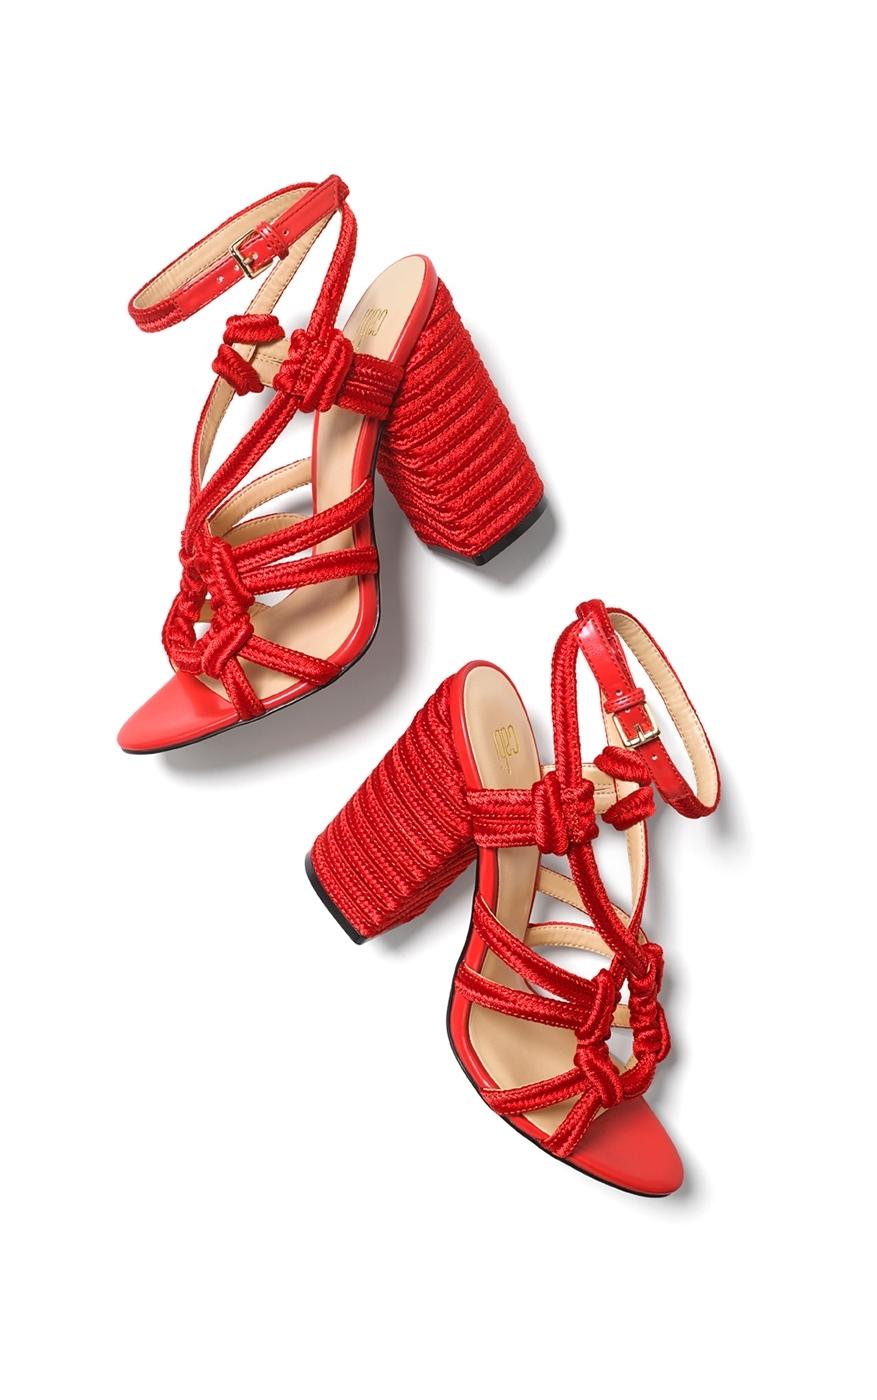 cabi's Tiptoe Sandal